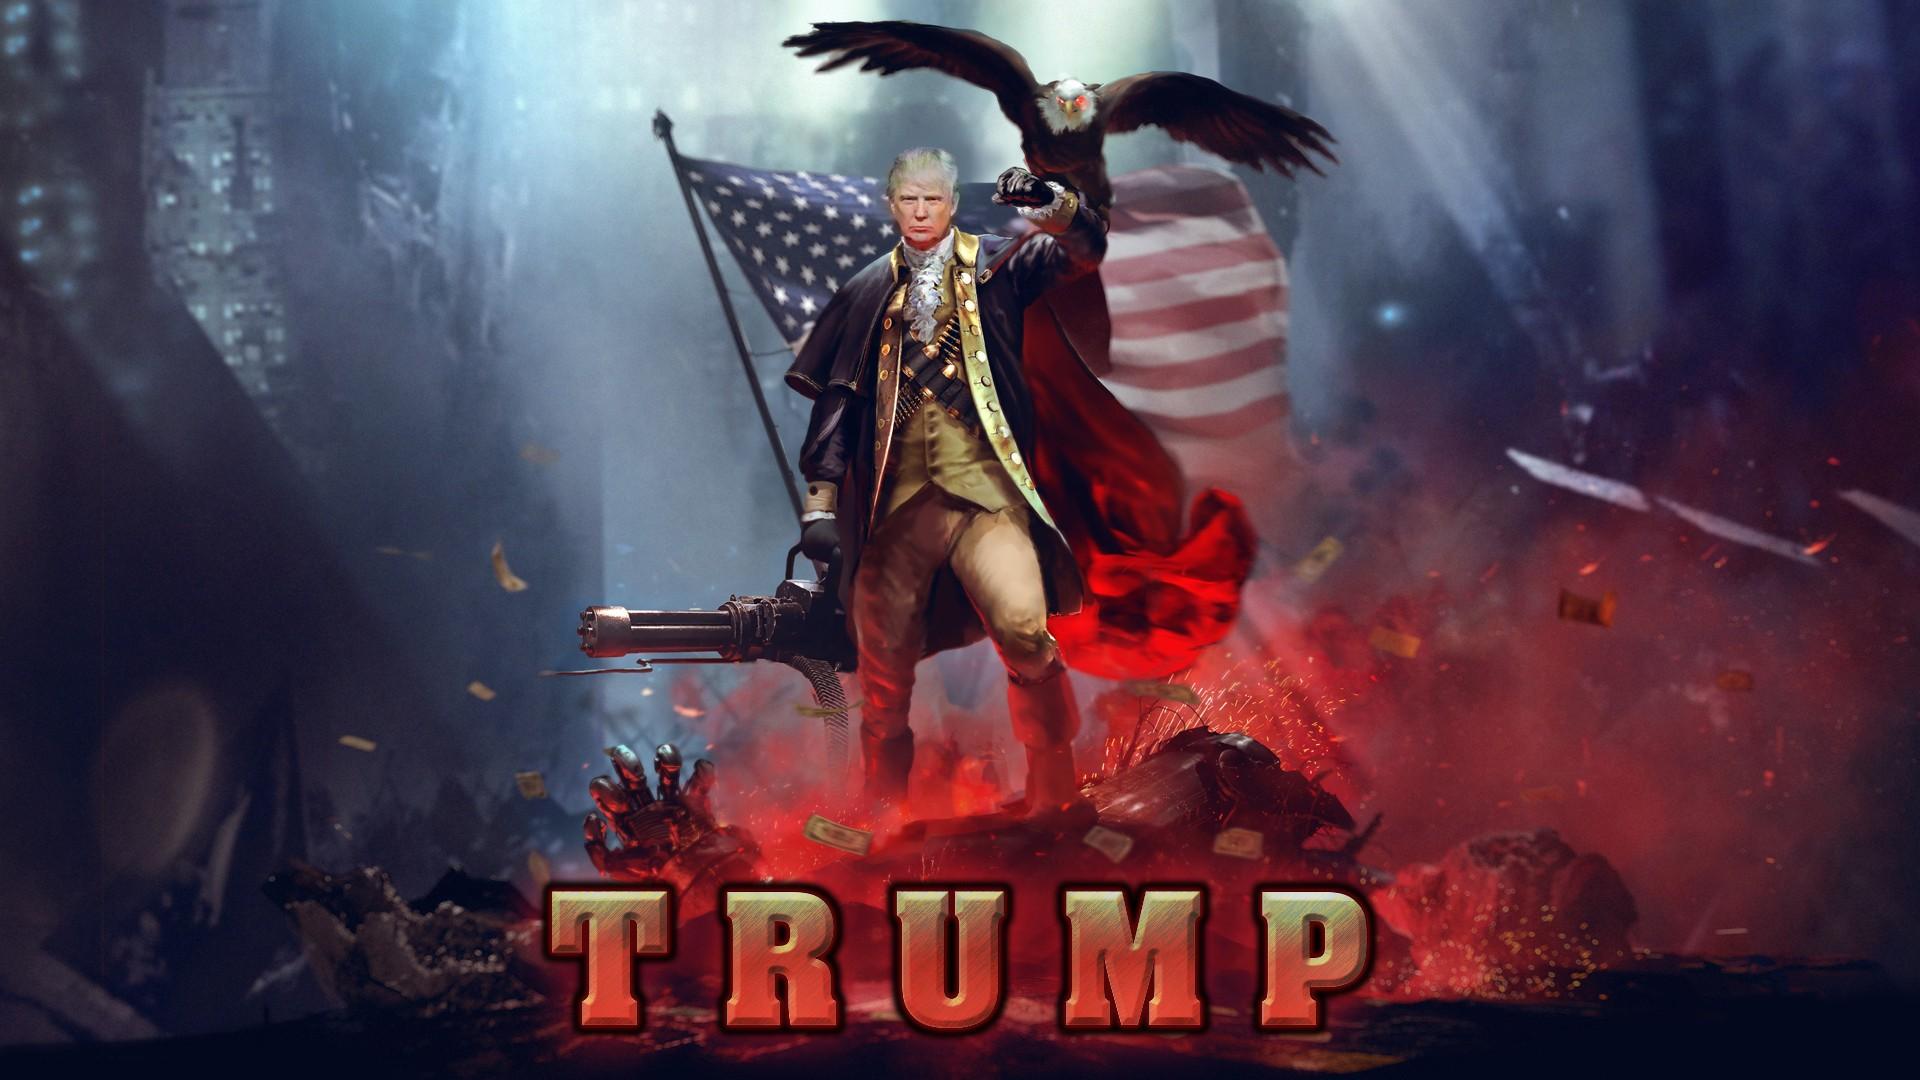 Wallpaper Of The Day: Patriotic Trump - Common Sense ...